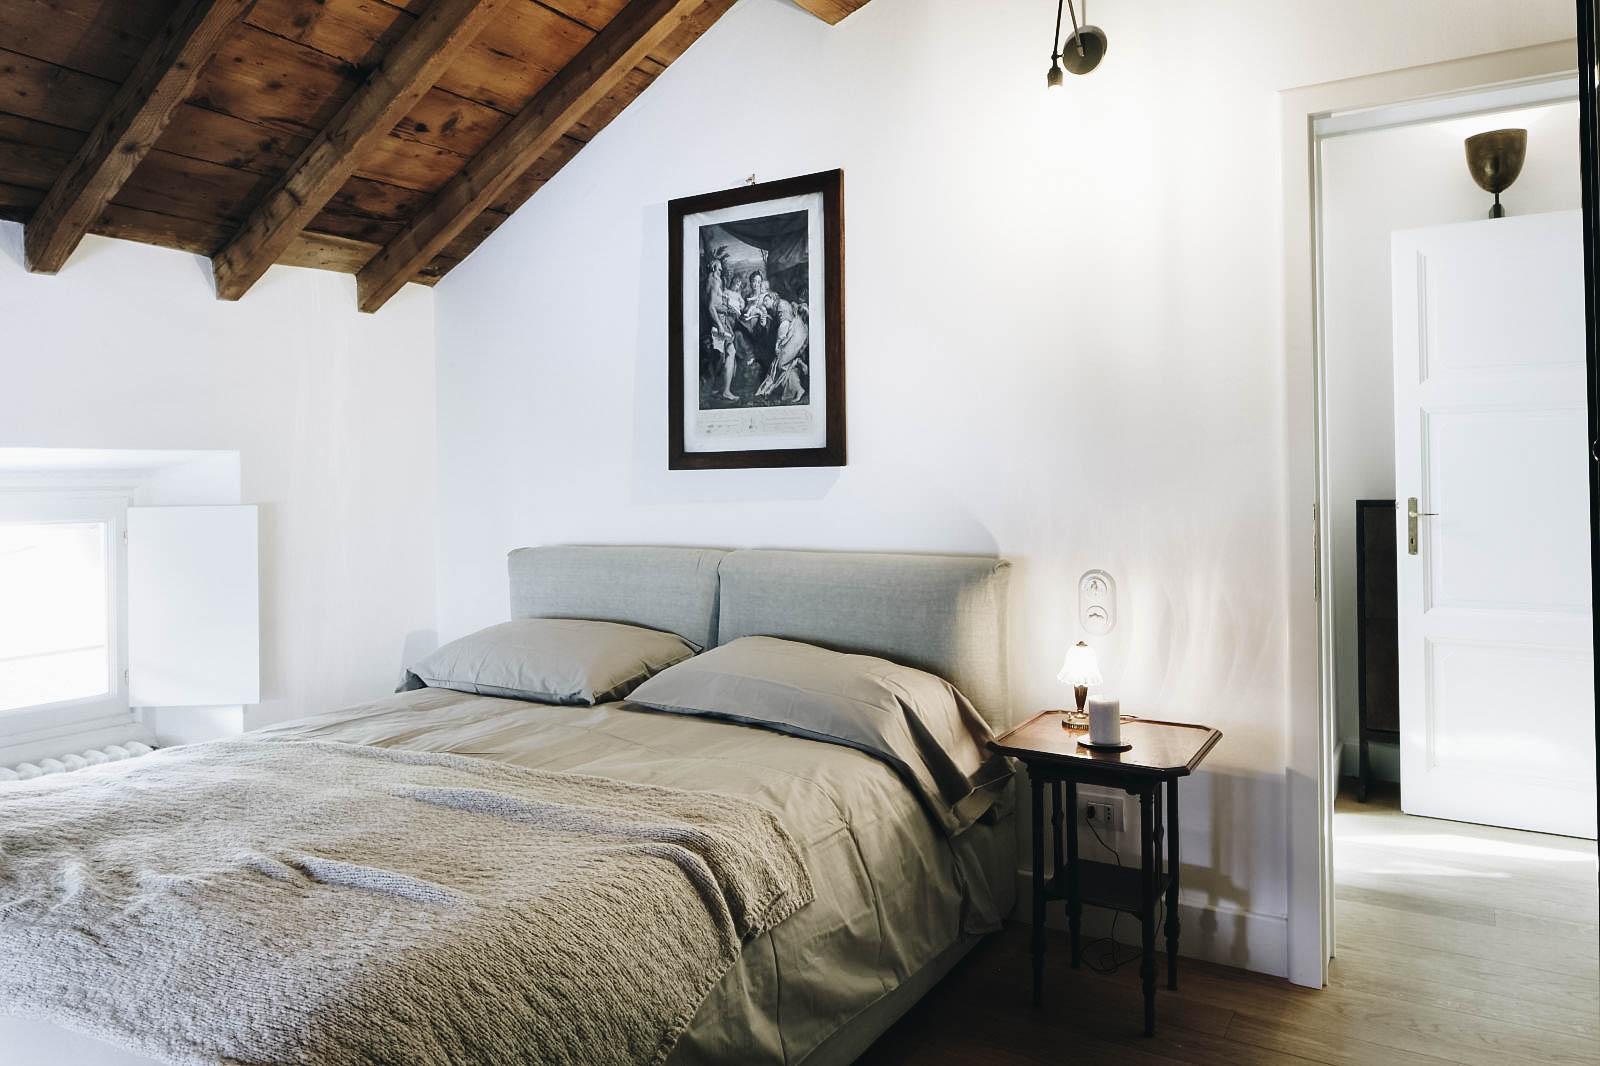 villa-como-lake-italy-view-luxury-modern-luce-bed-4.jpg